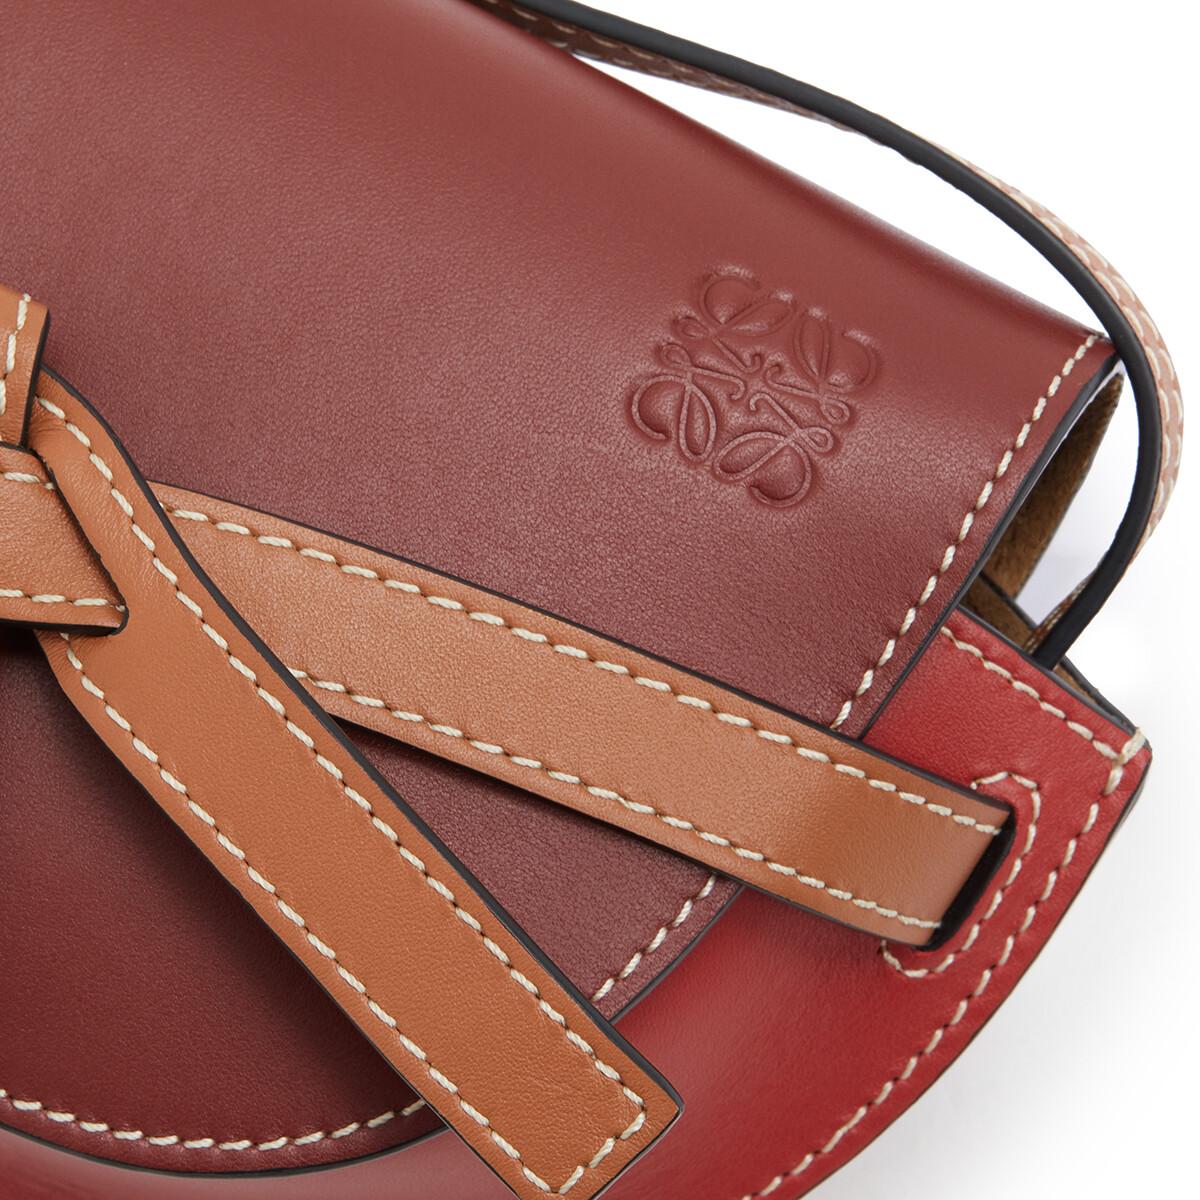 LOEWE Gate Mini Bag Garnet/Pomodoro front